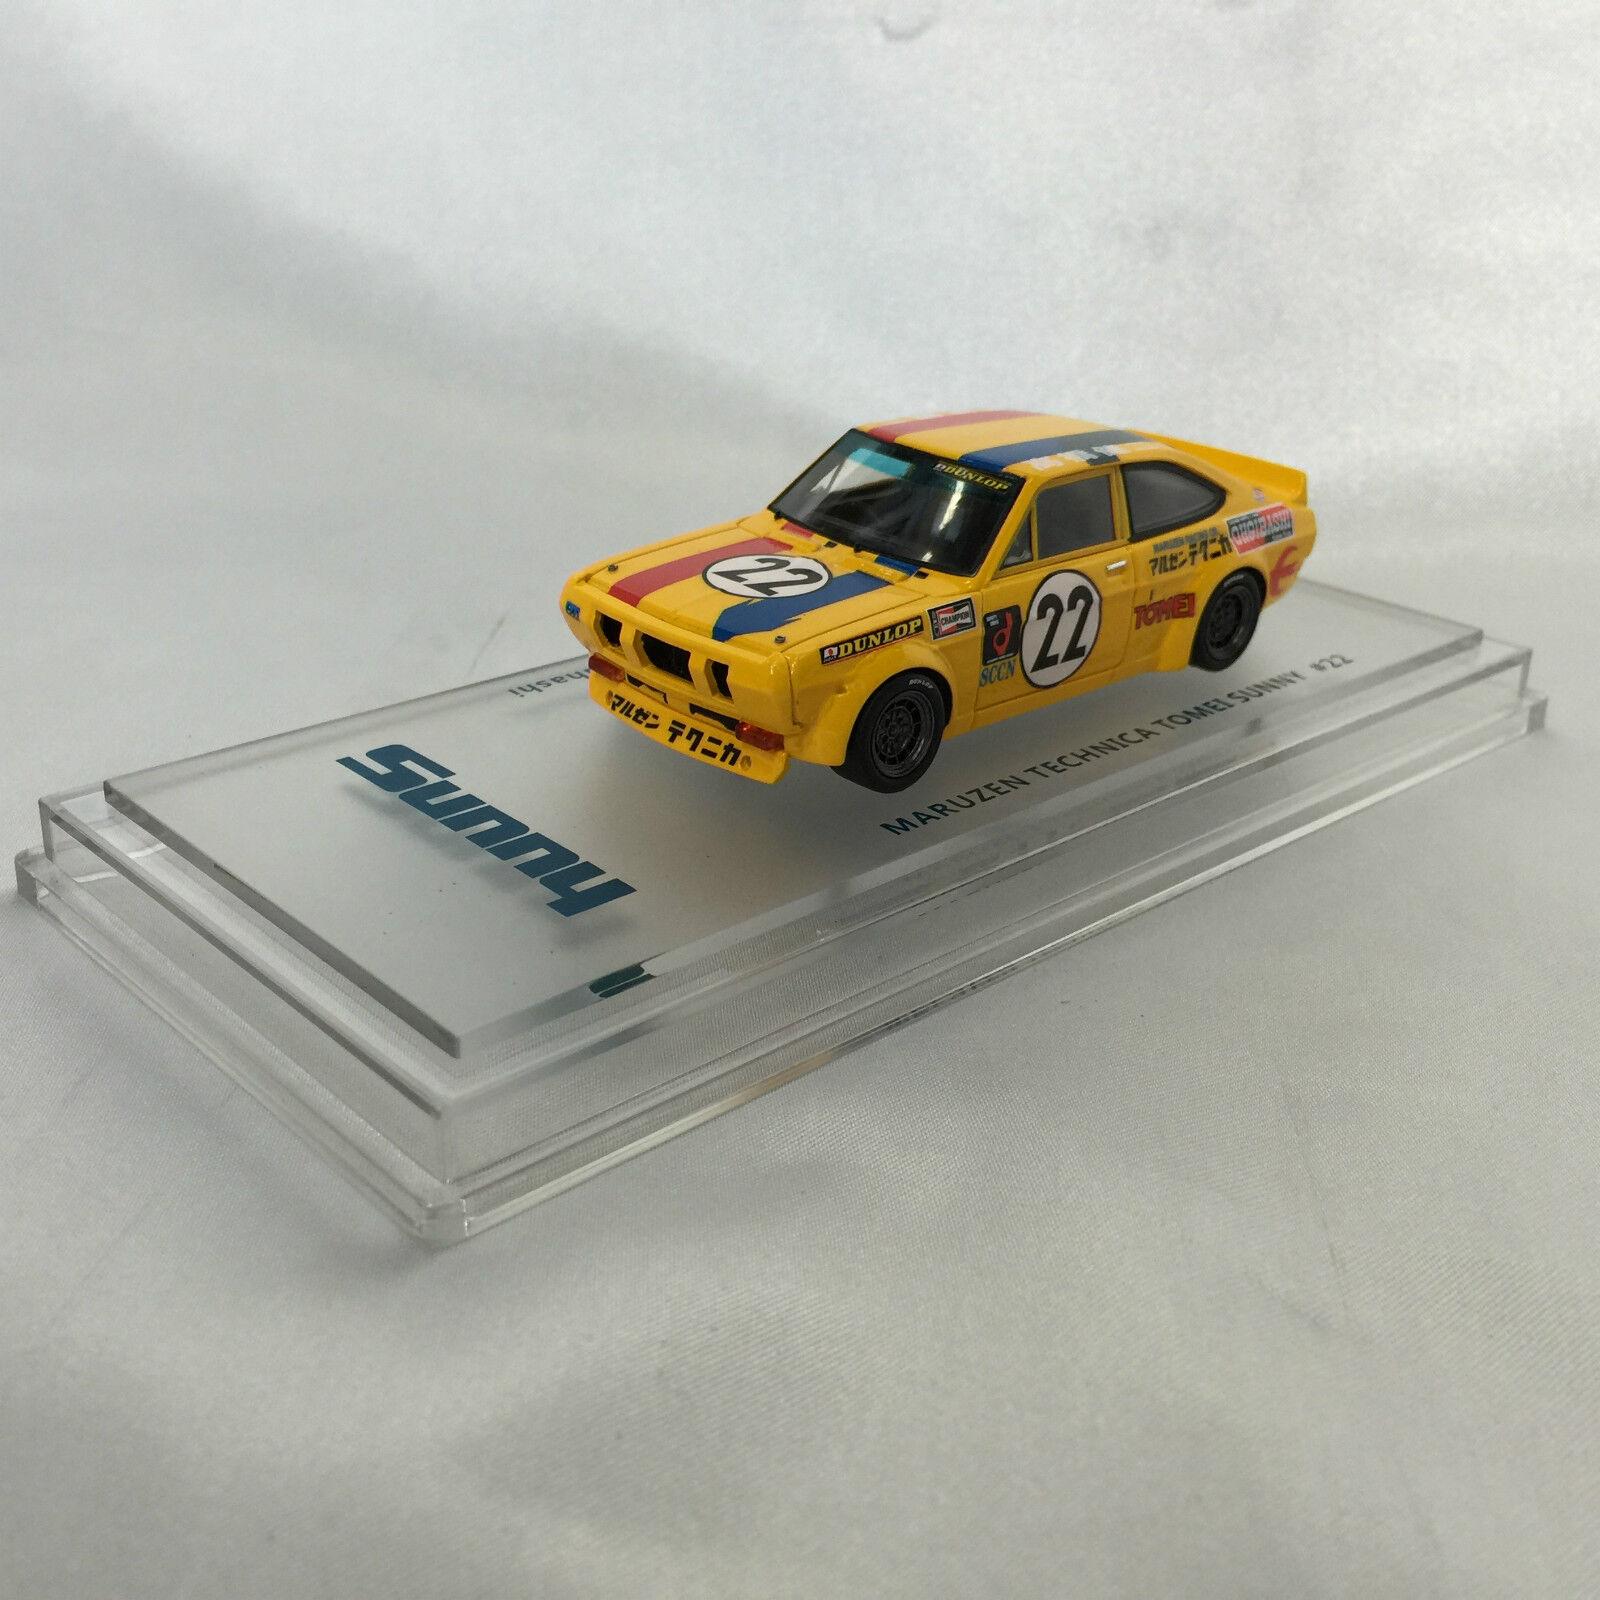 Datsun Sunny 1200 TS Maruzen Technica  22 1 43 Enif KB110 A12 coupé garçons +14